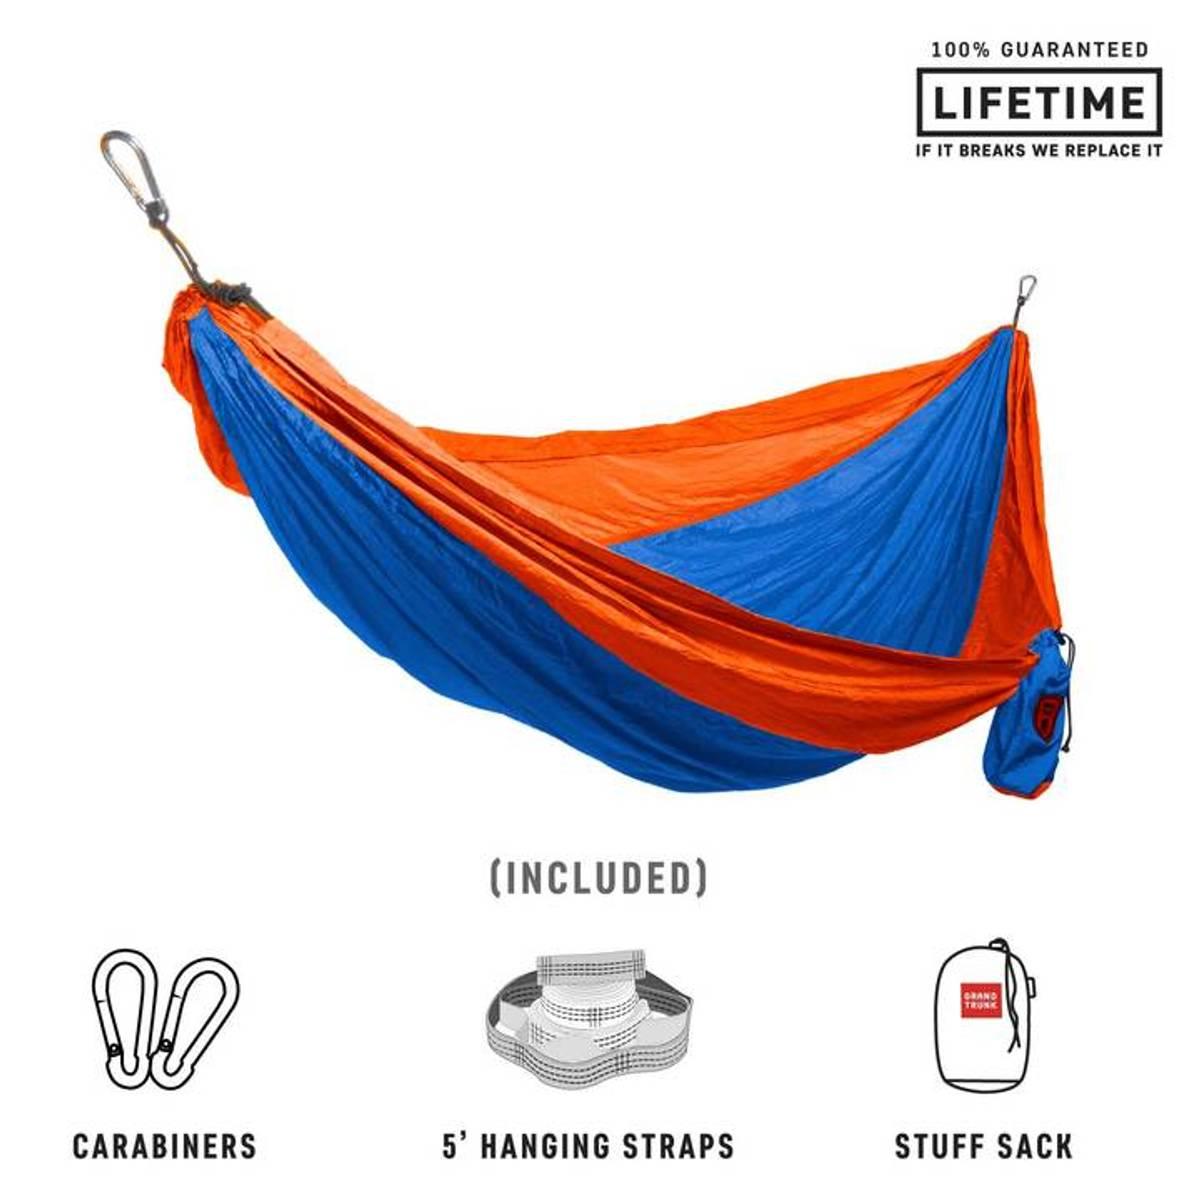 Grand Trunk Double Parachute Nylon Hammock with Straps Blue/Oran